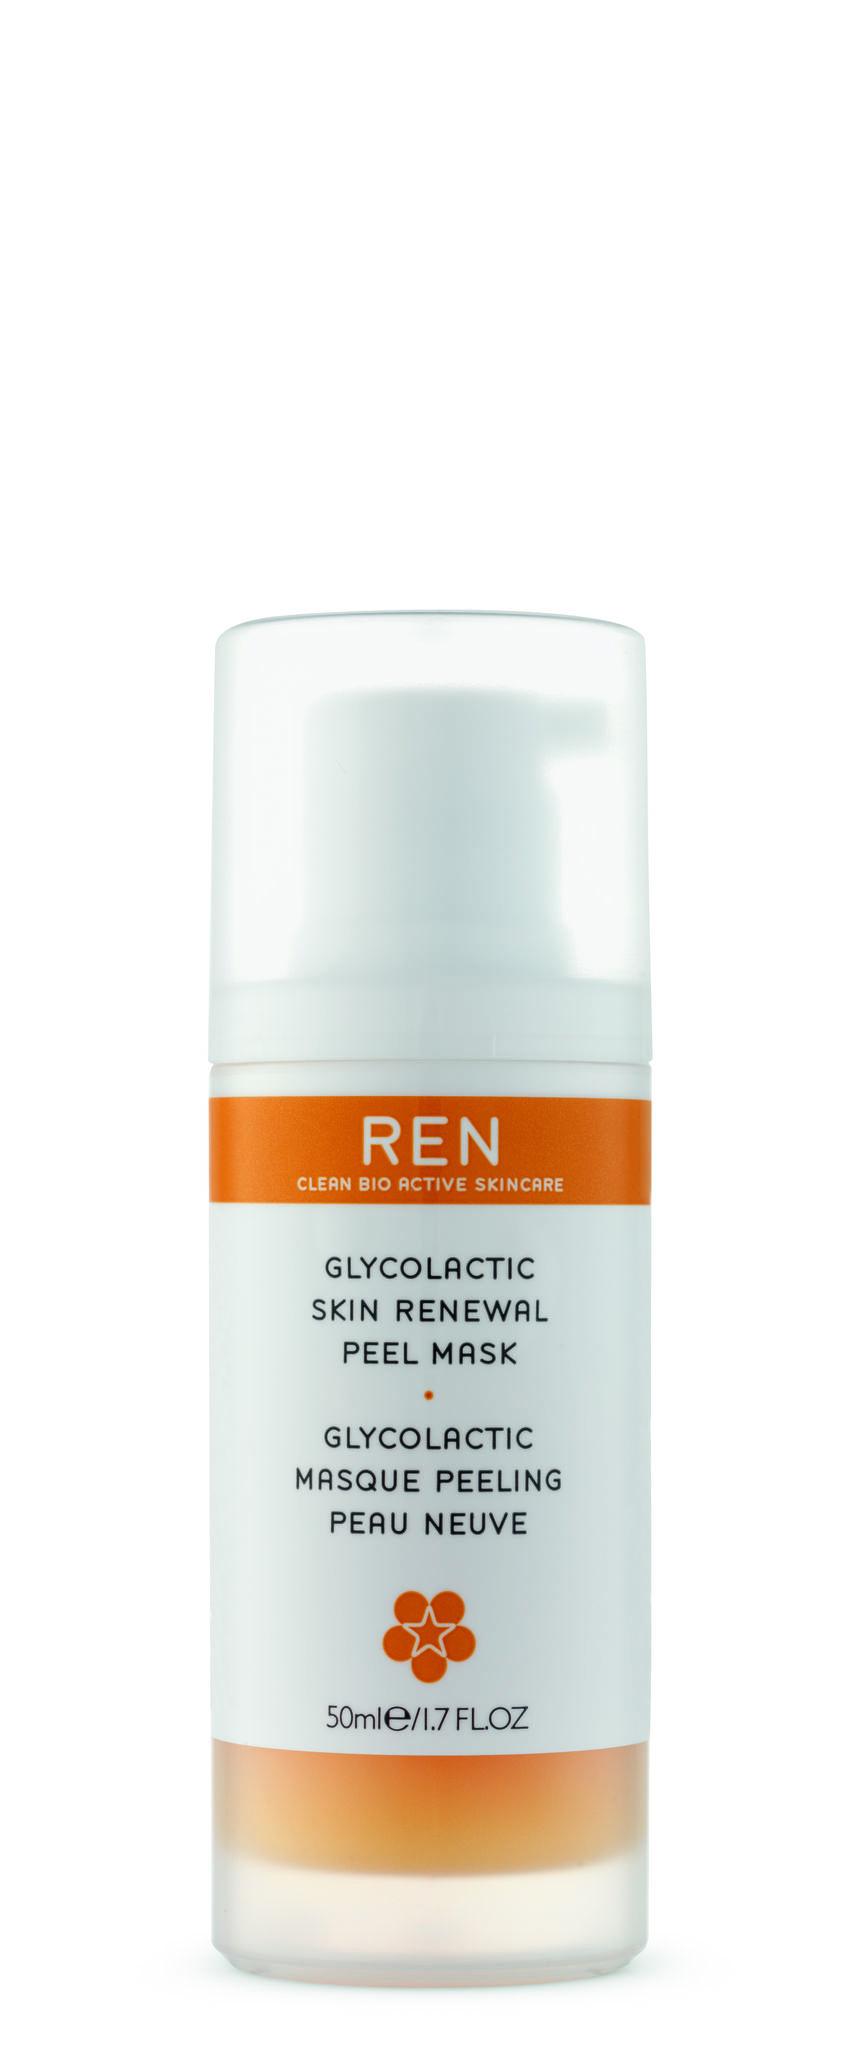 ren glycolactic skin renewal peel mask 50ml EShave Face Wash White Tea 113g/4oz